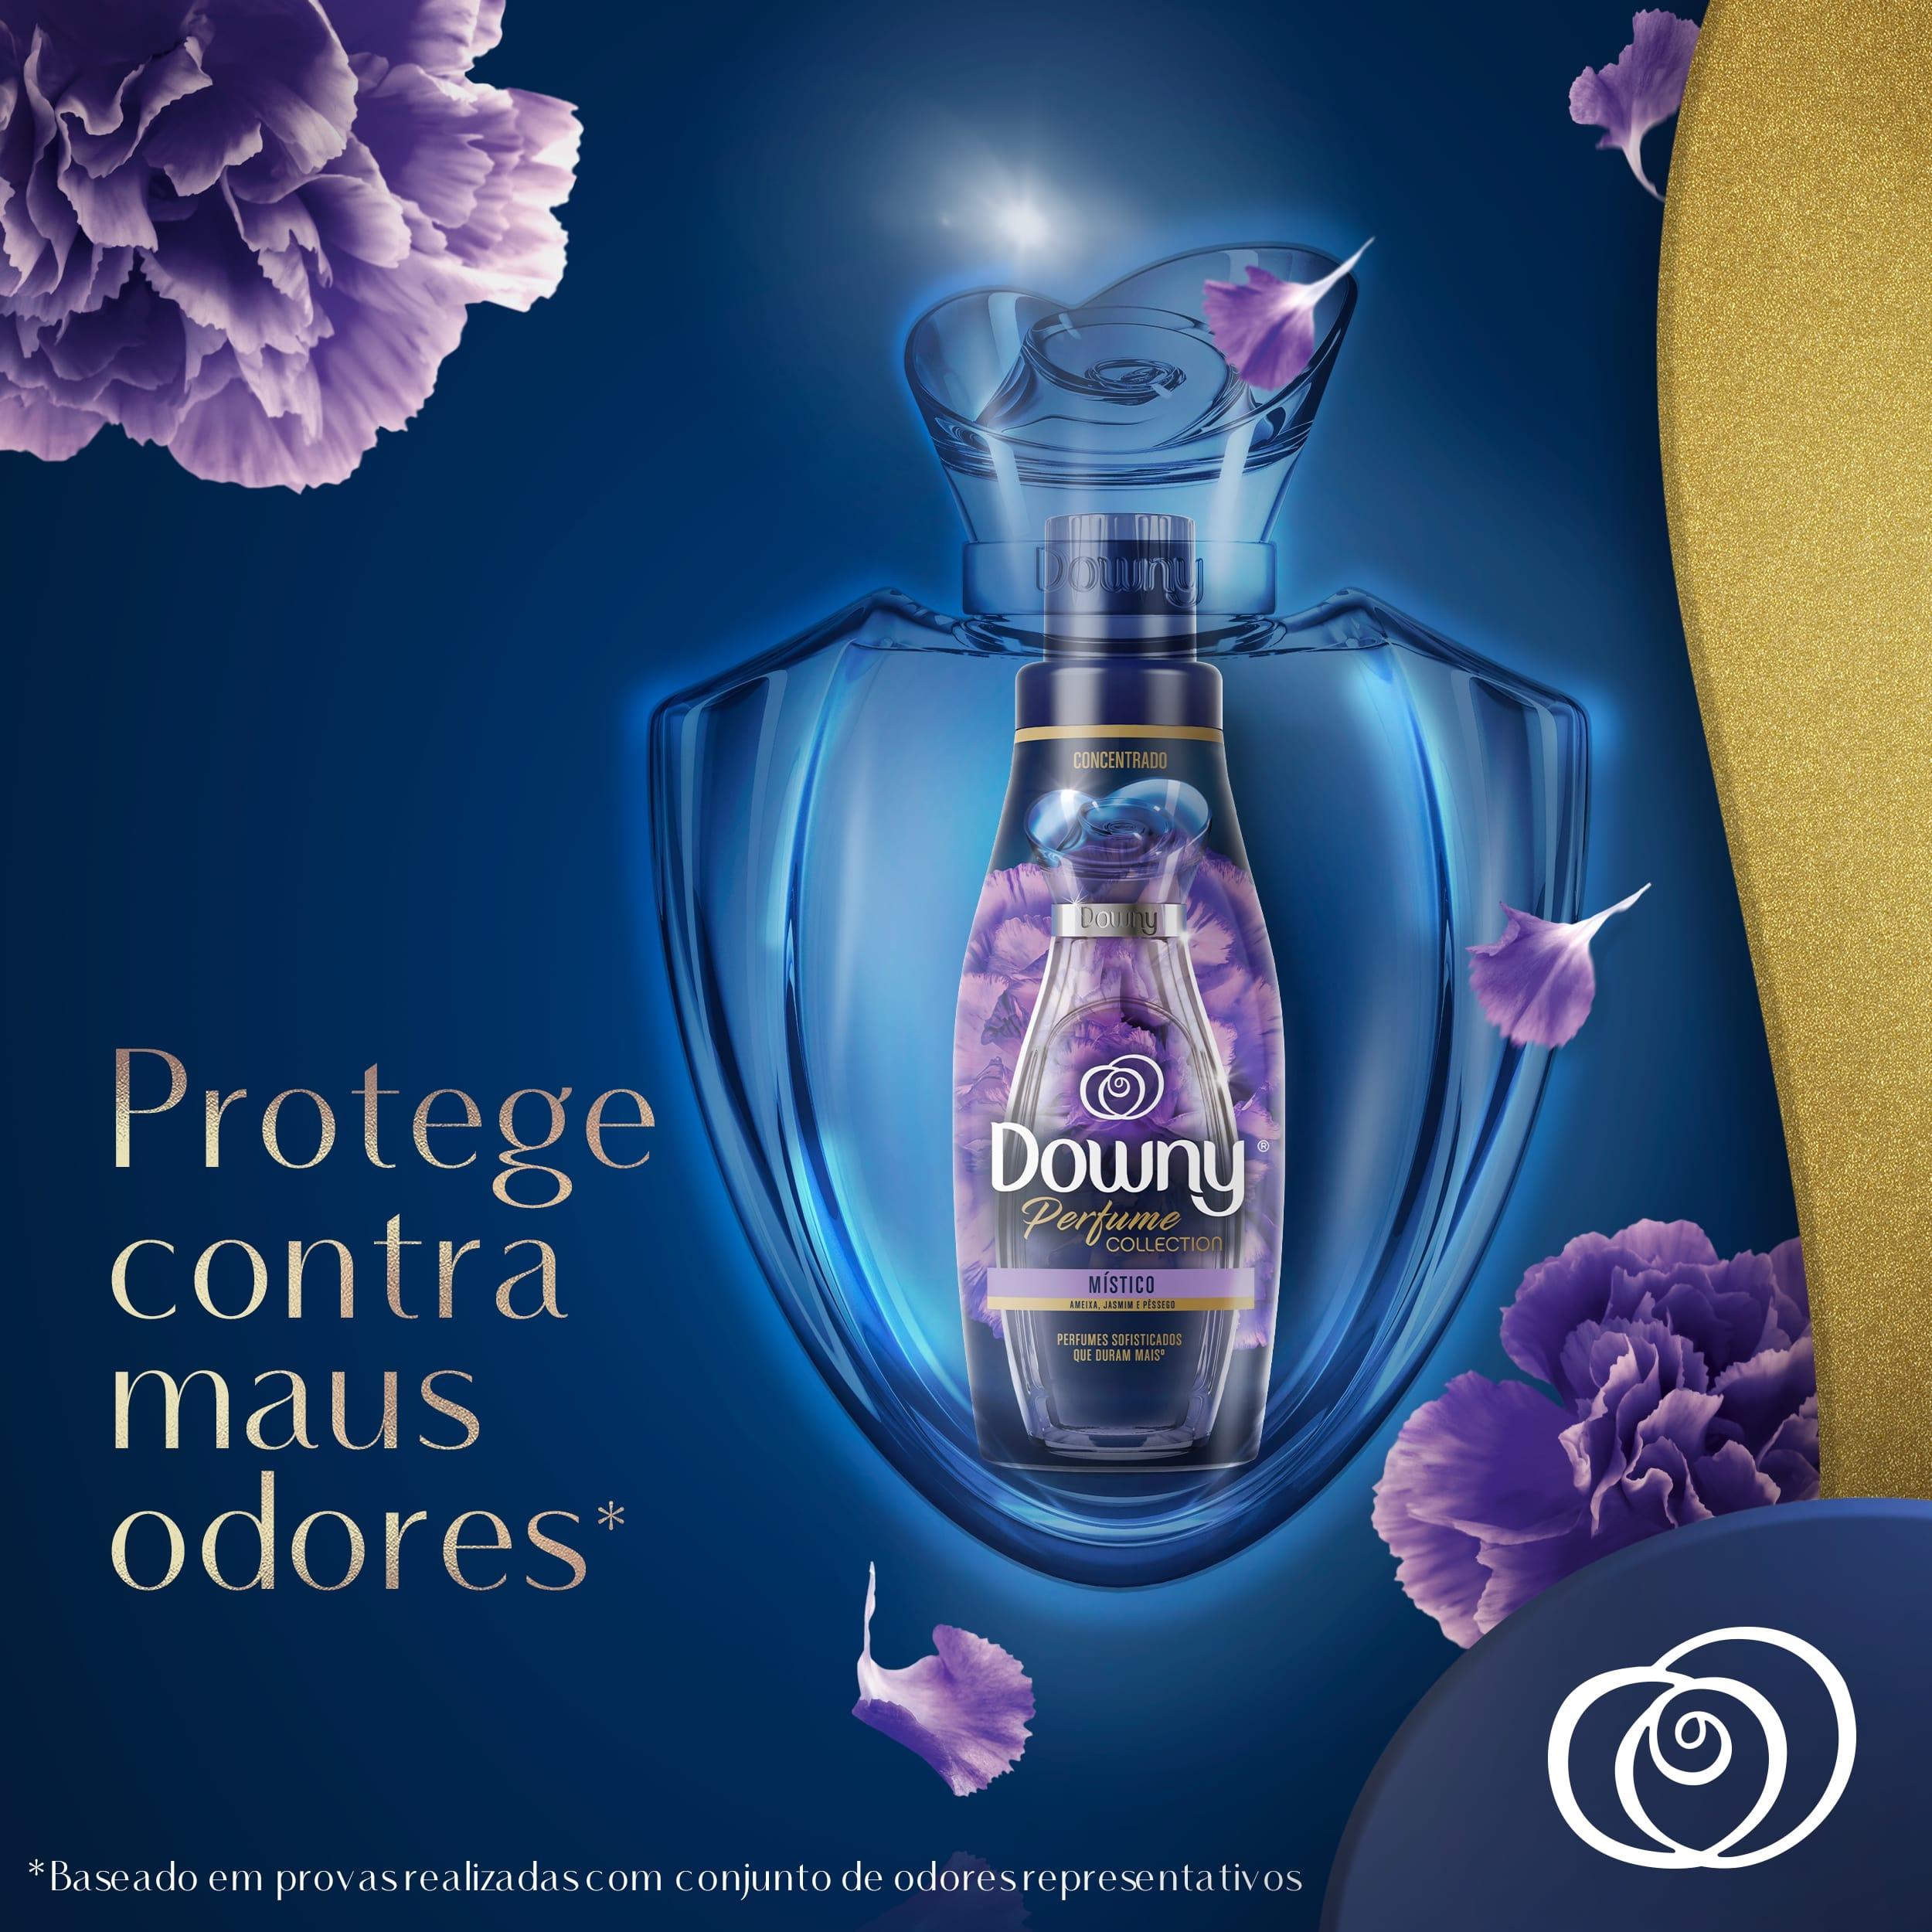 Amaciante Downy Perfume Collection Místico Secondary 01